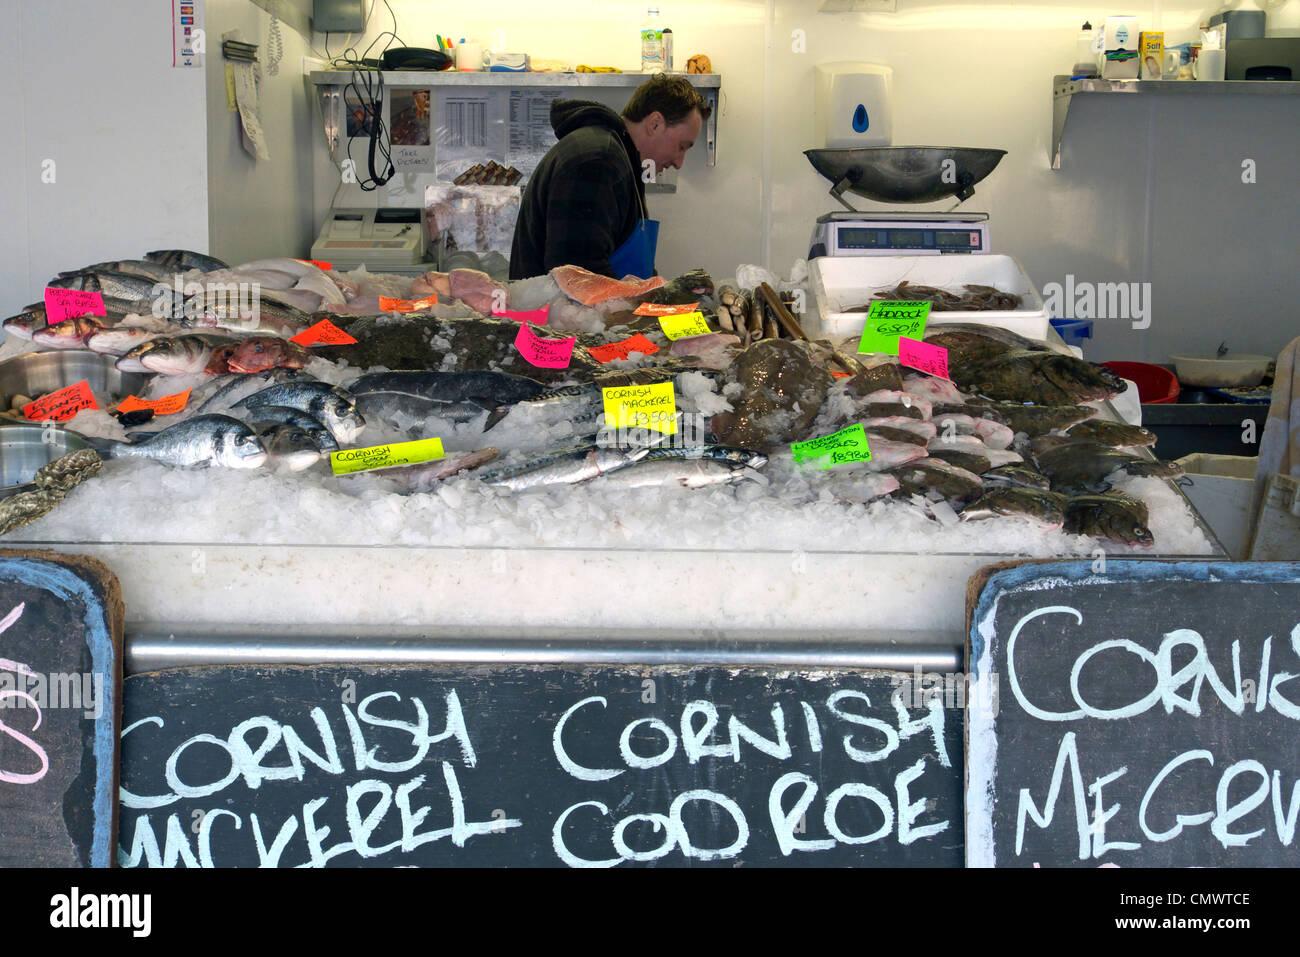 united kingdom west sussex littlehampton riverside fish shop a wet fish display - Stock Image